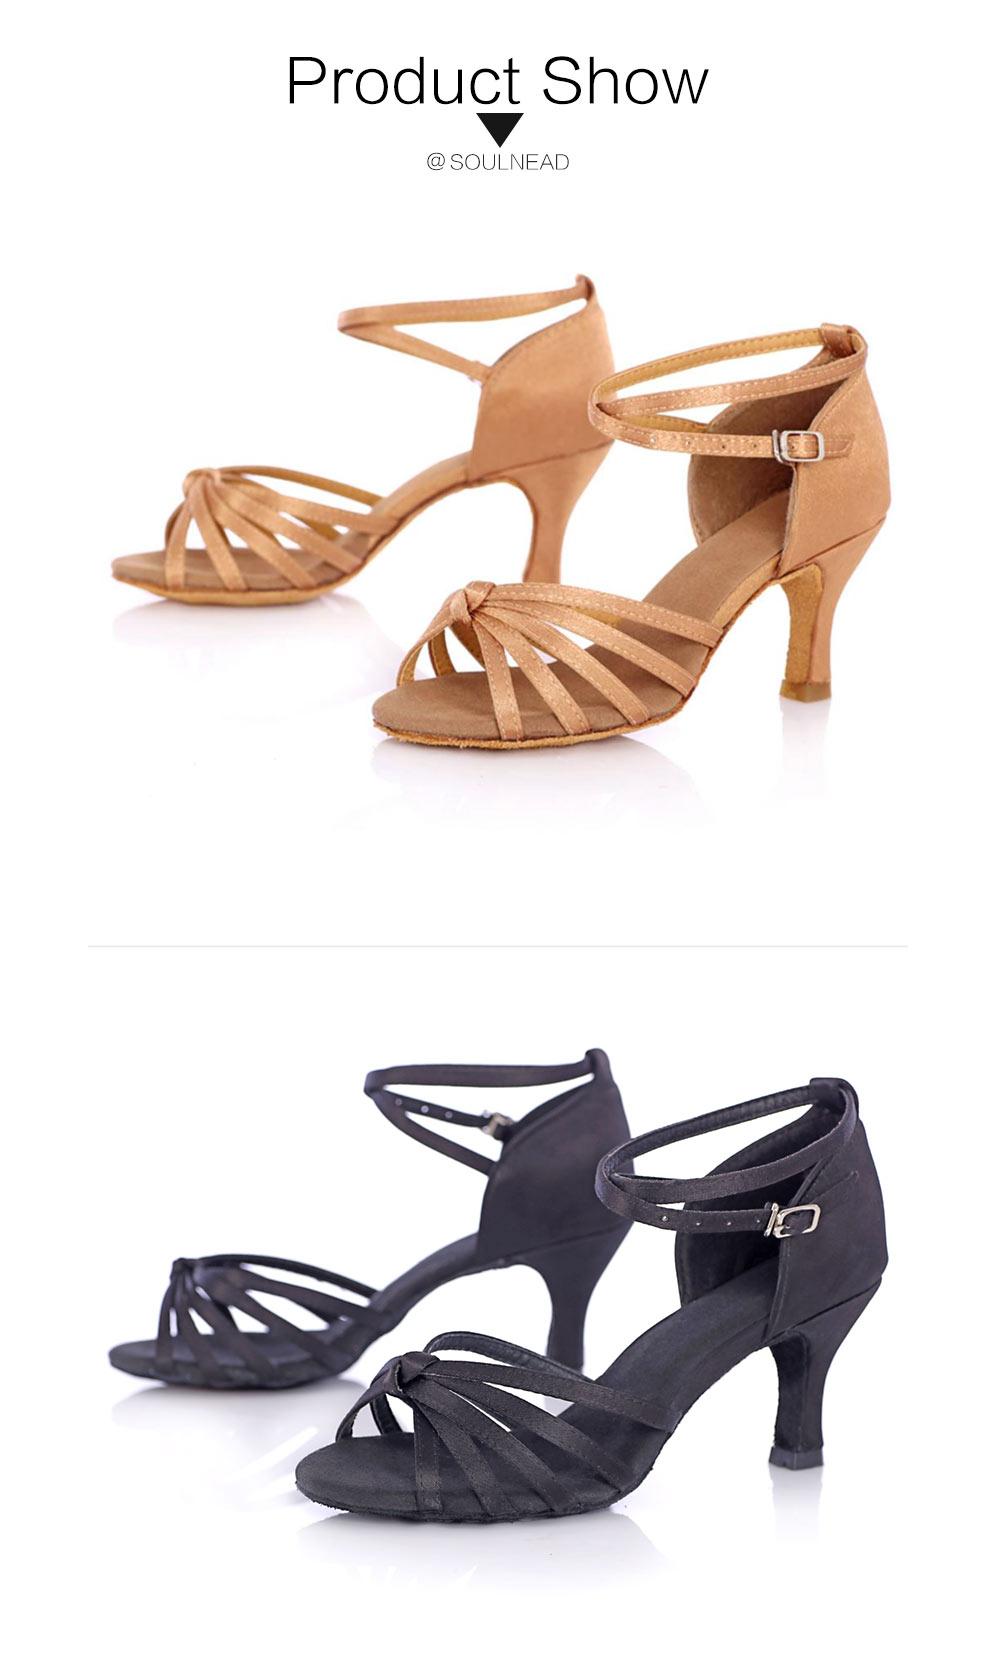 Latin Dance Shoes For Women Salsa Tango Ballroom Dance Shoes High Heels soft Dancing Shoes 5 7cm Heel zapatos baile comfortable (9)